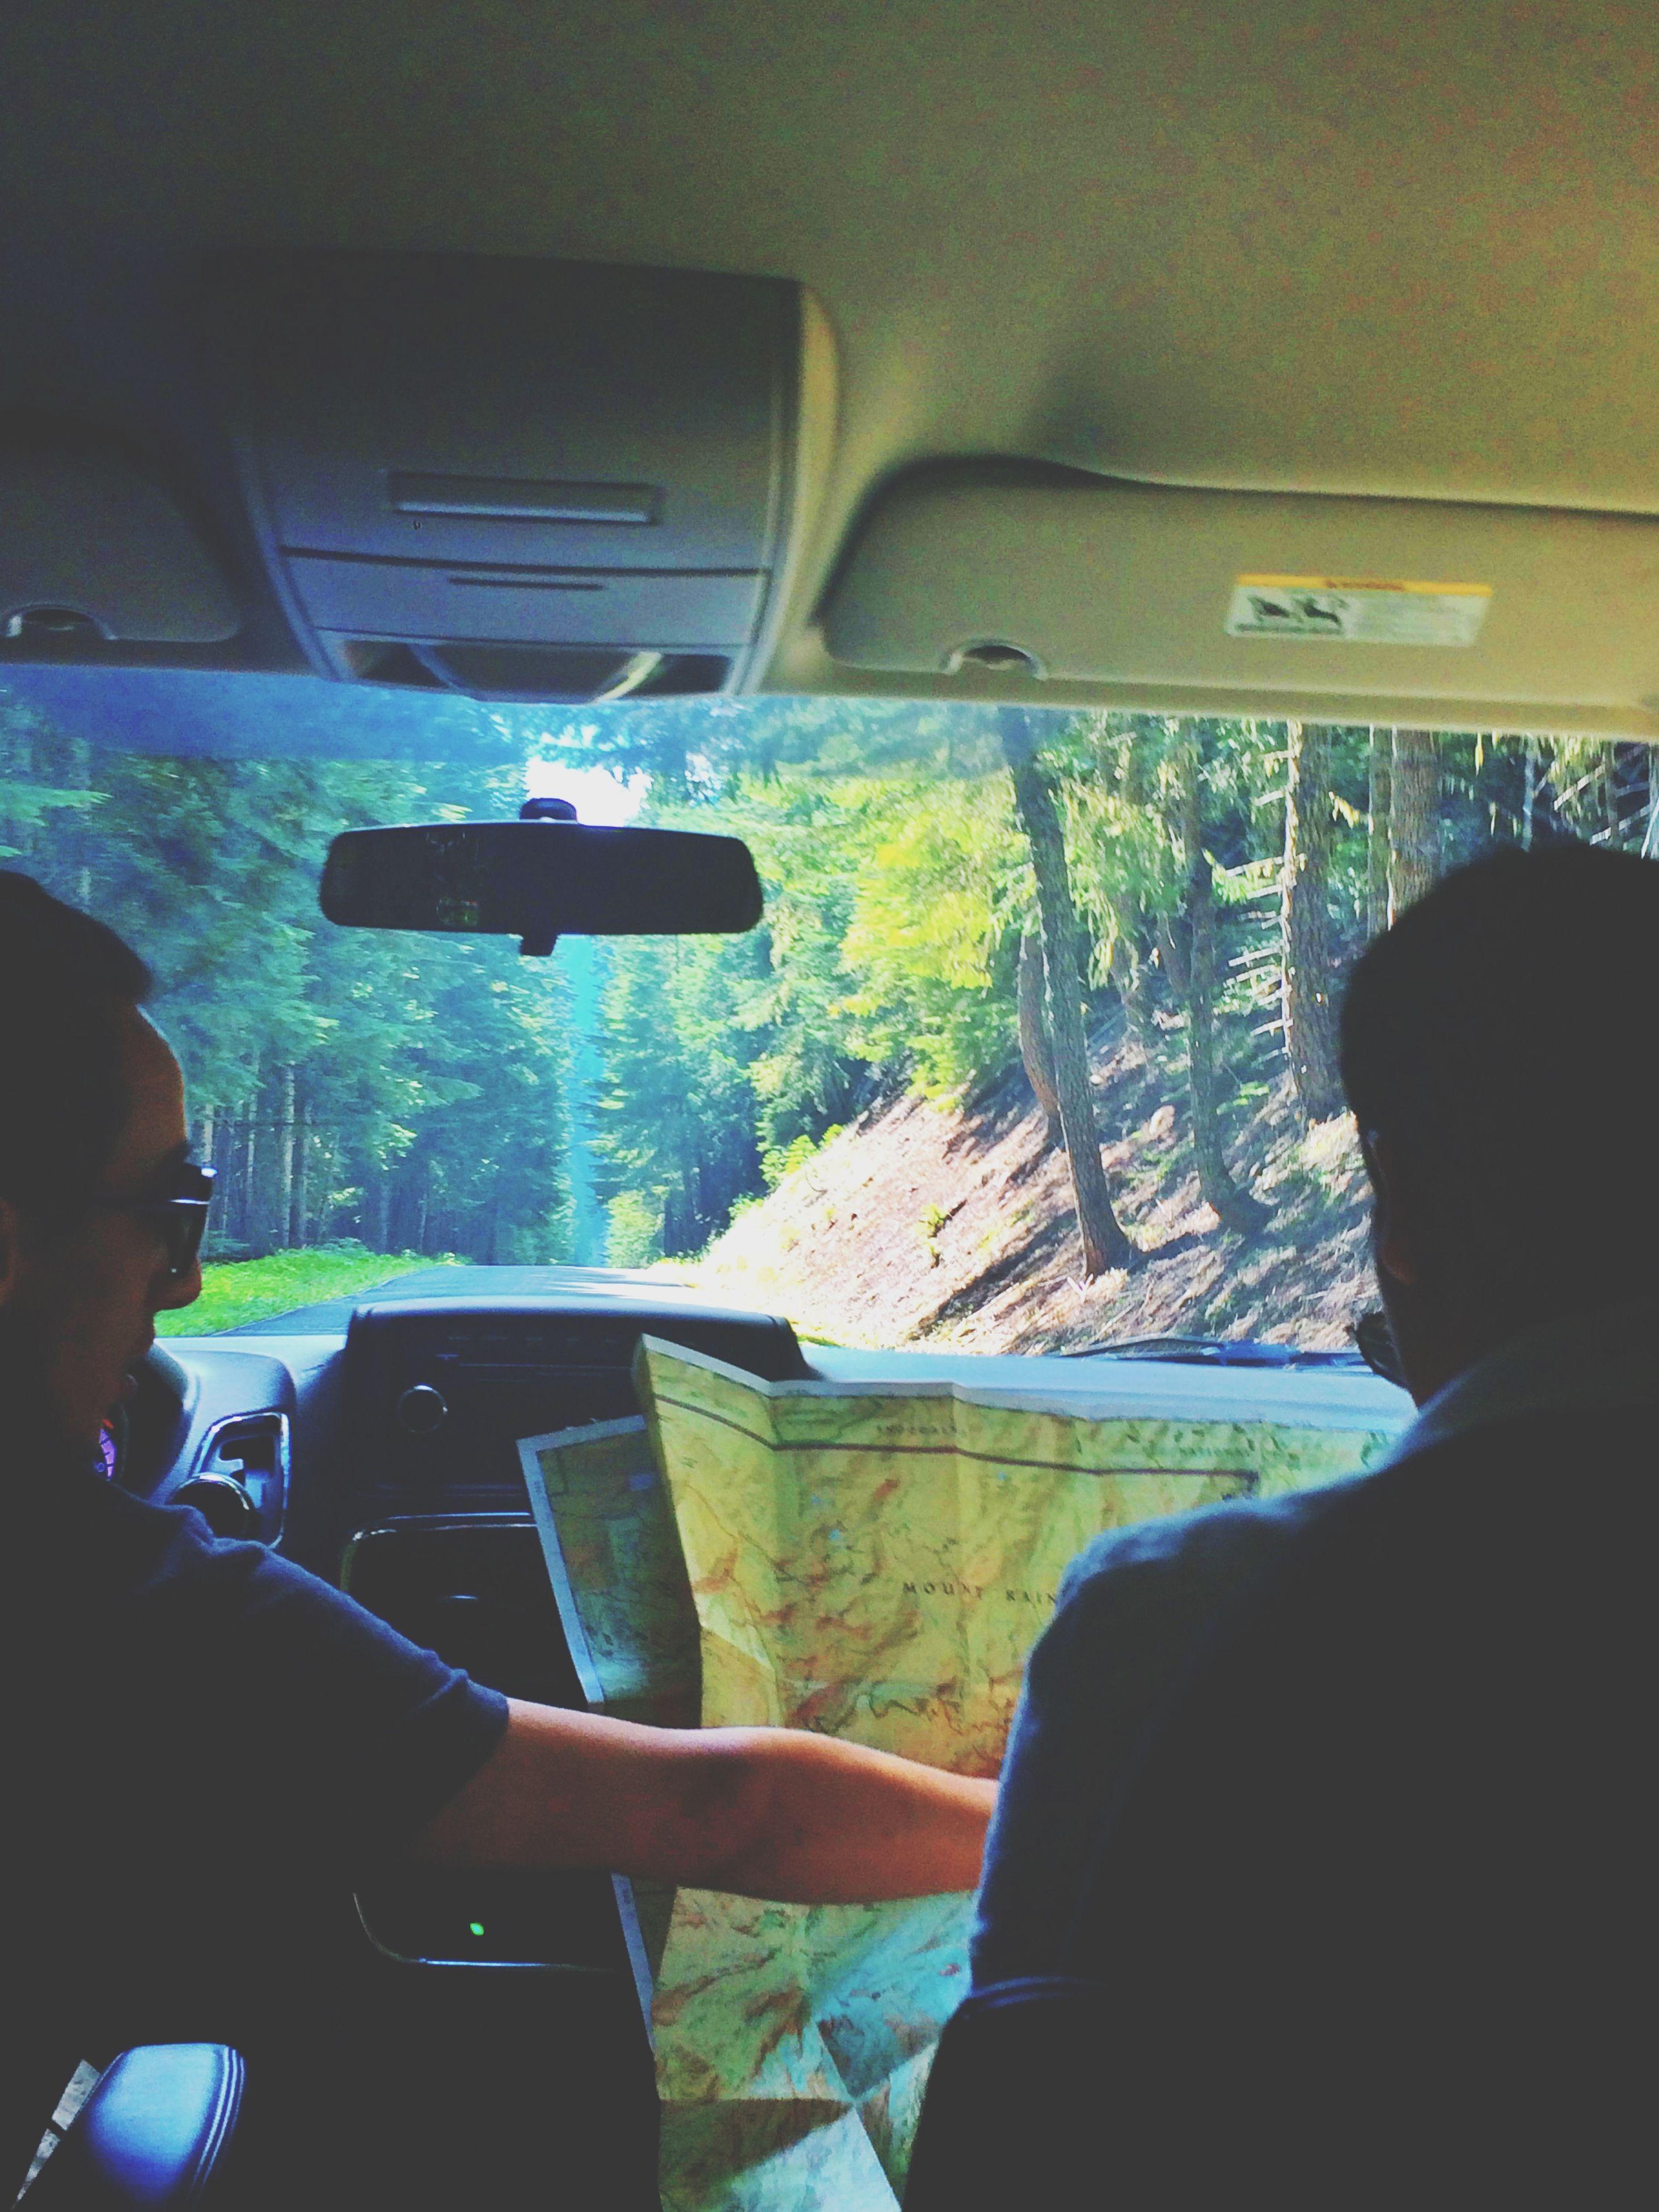 transportation, vehicle interior, lifestyles, mode of transport, land vehicle, car, men, leisure activity, window, travel, indoors, sitting, car interior, vehicle seat, headshot, journey, technology, rear view